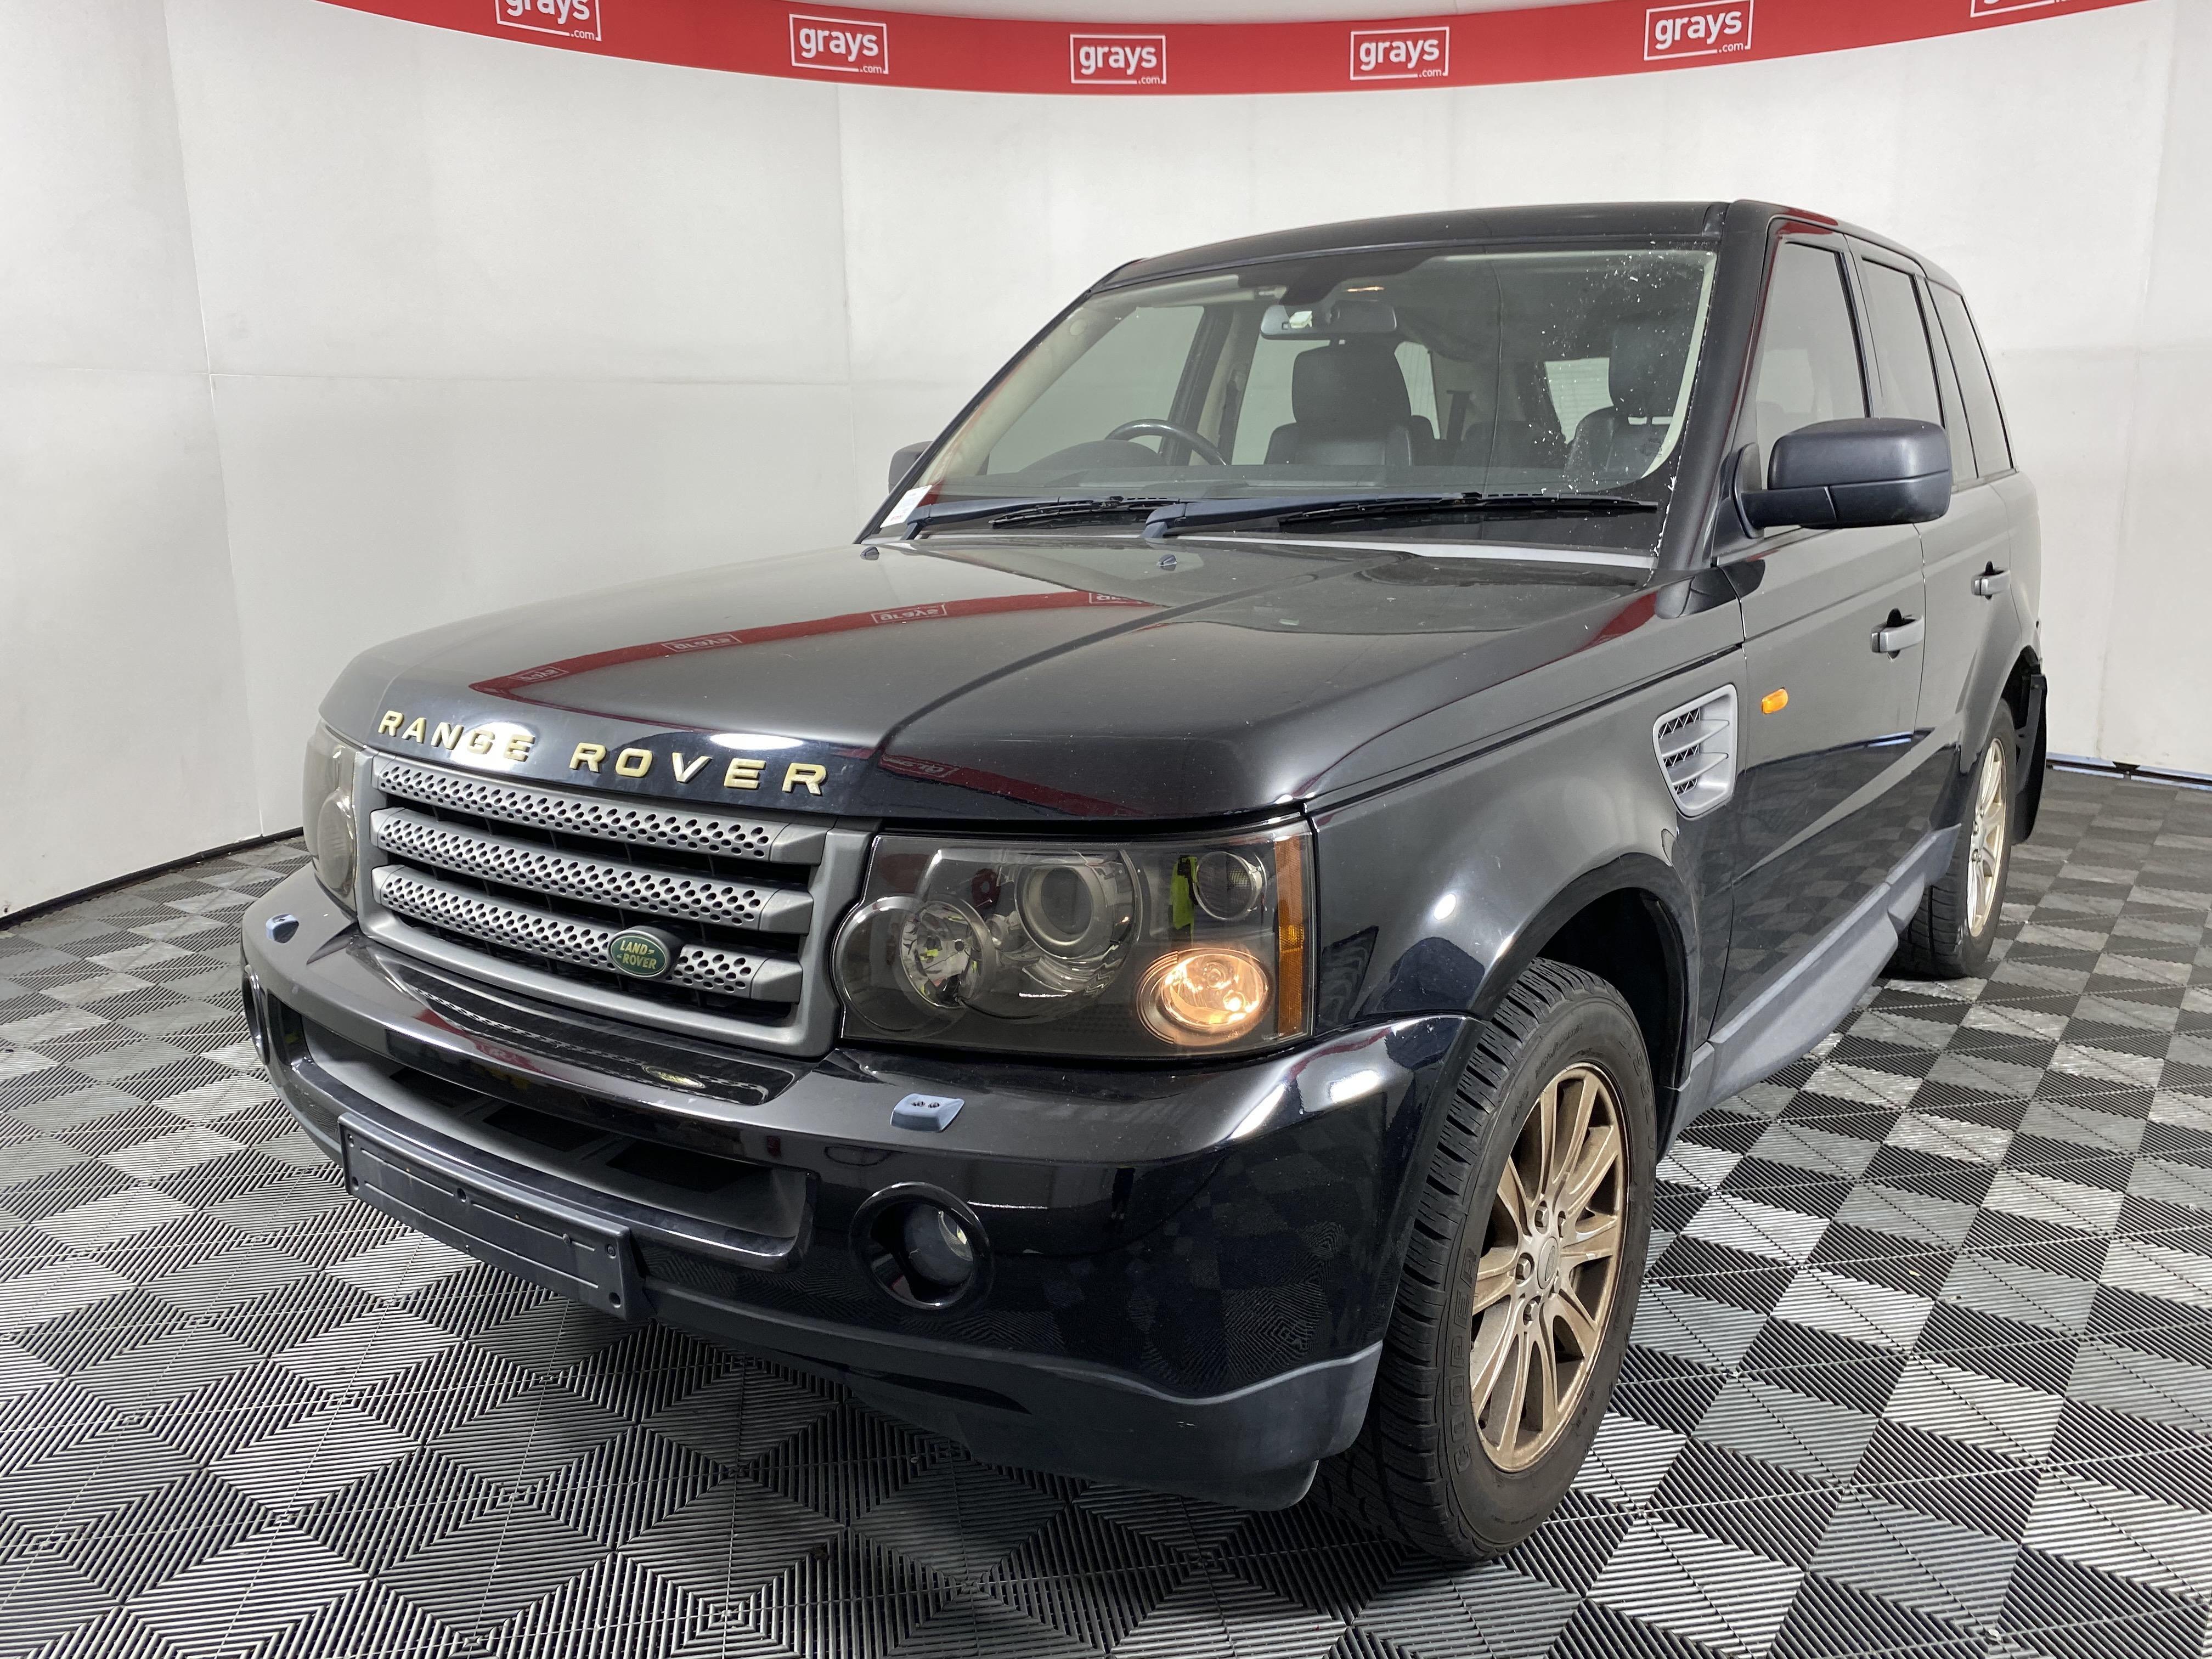 2006 (2007) Land Rover Range Rover Sport TDV6 T/Diesel Auto Wagon